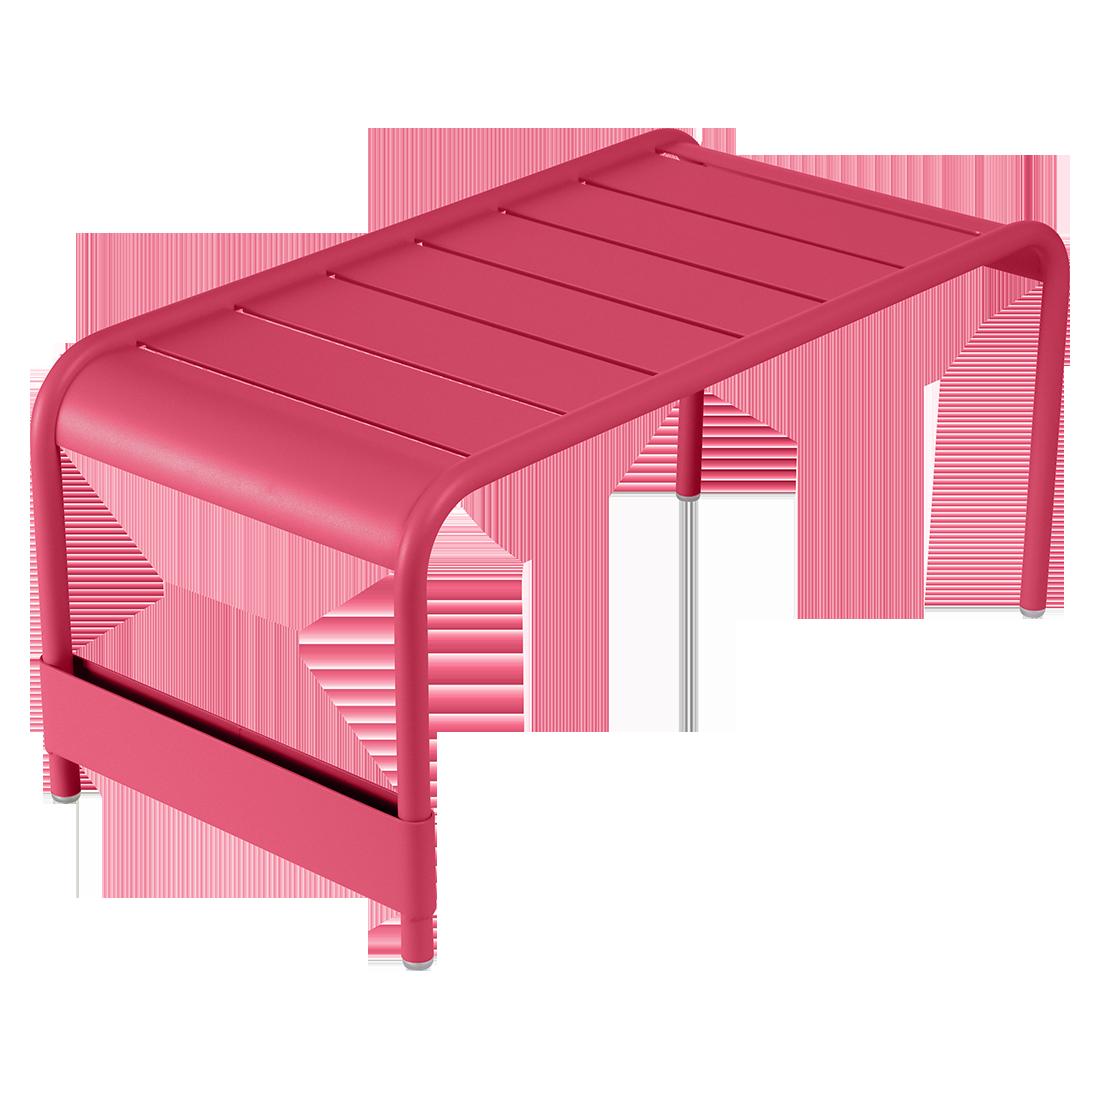 table basse metal, table basse fermob, table basse rose, banc de jardin, salon de jardin